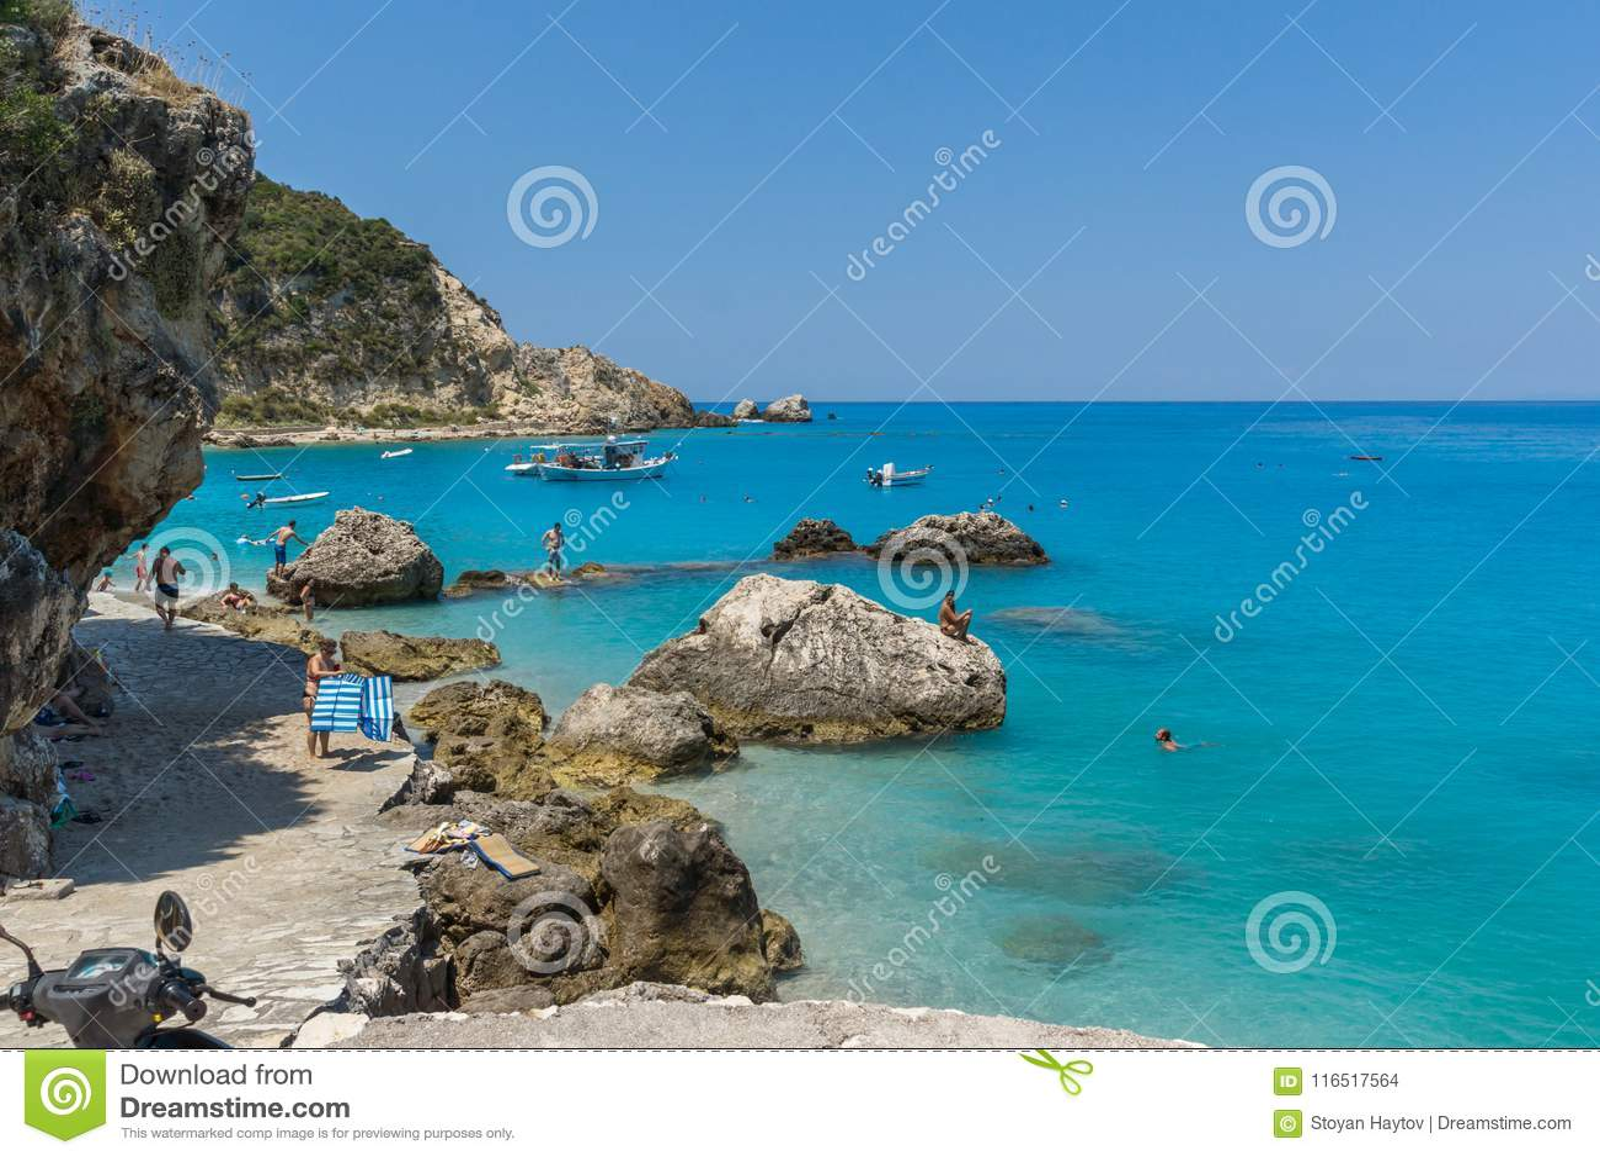 Touristes visitant la plage du village d Agios Nikitas, Leucade, îles ioniennes, Gree